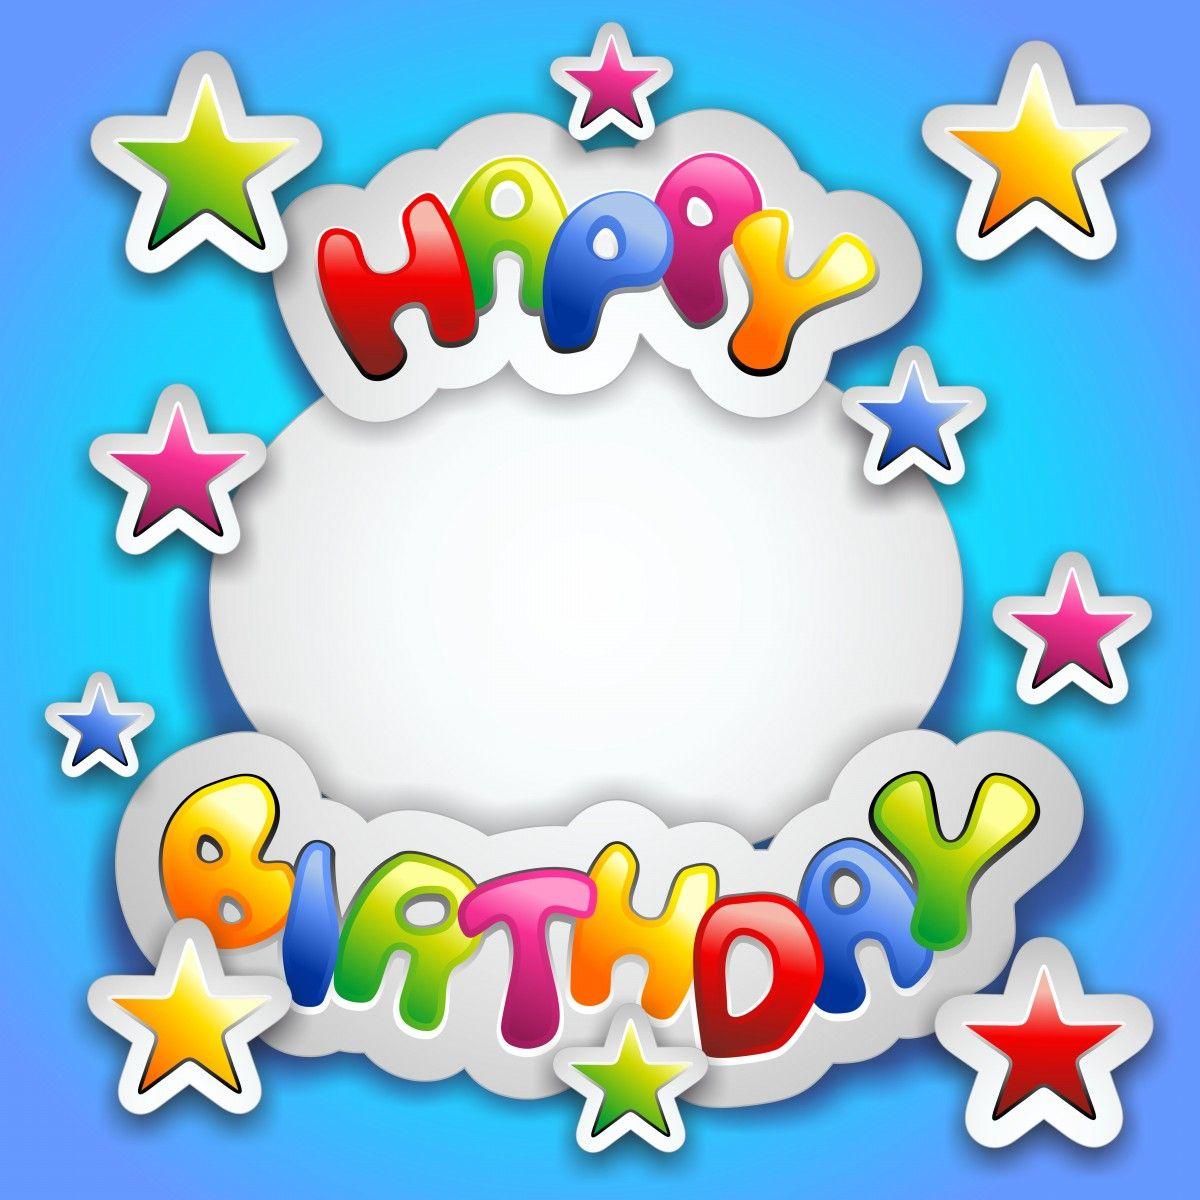 Birthday greetings for kids happy birthday greetings for children birthday greetings for kids happy birthday greetings for children 10 unique free cards kristyandbryce Gallery